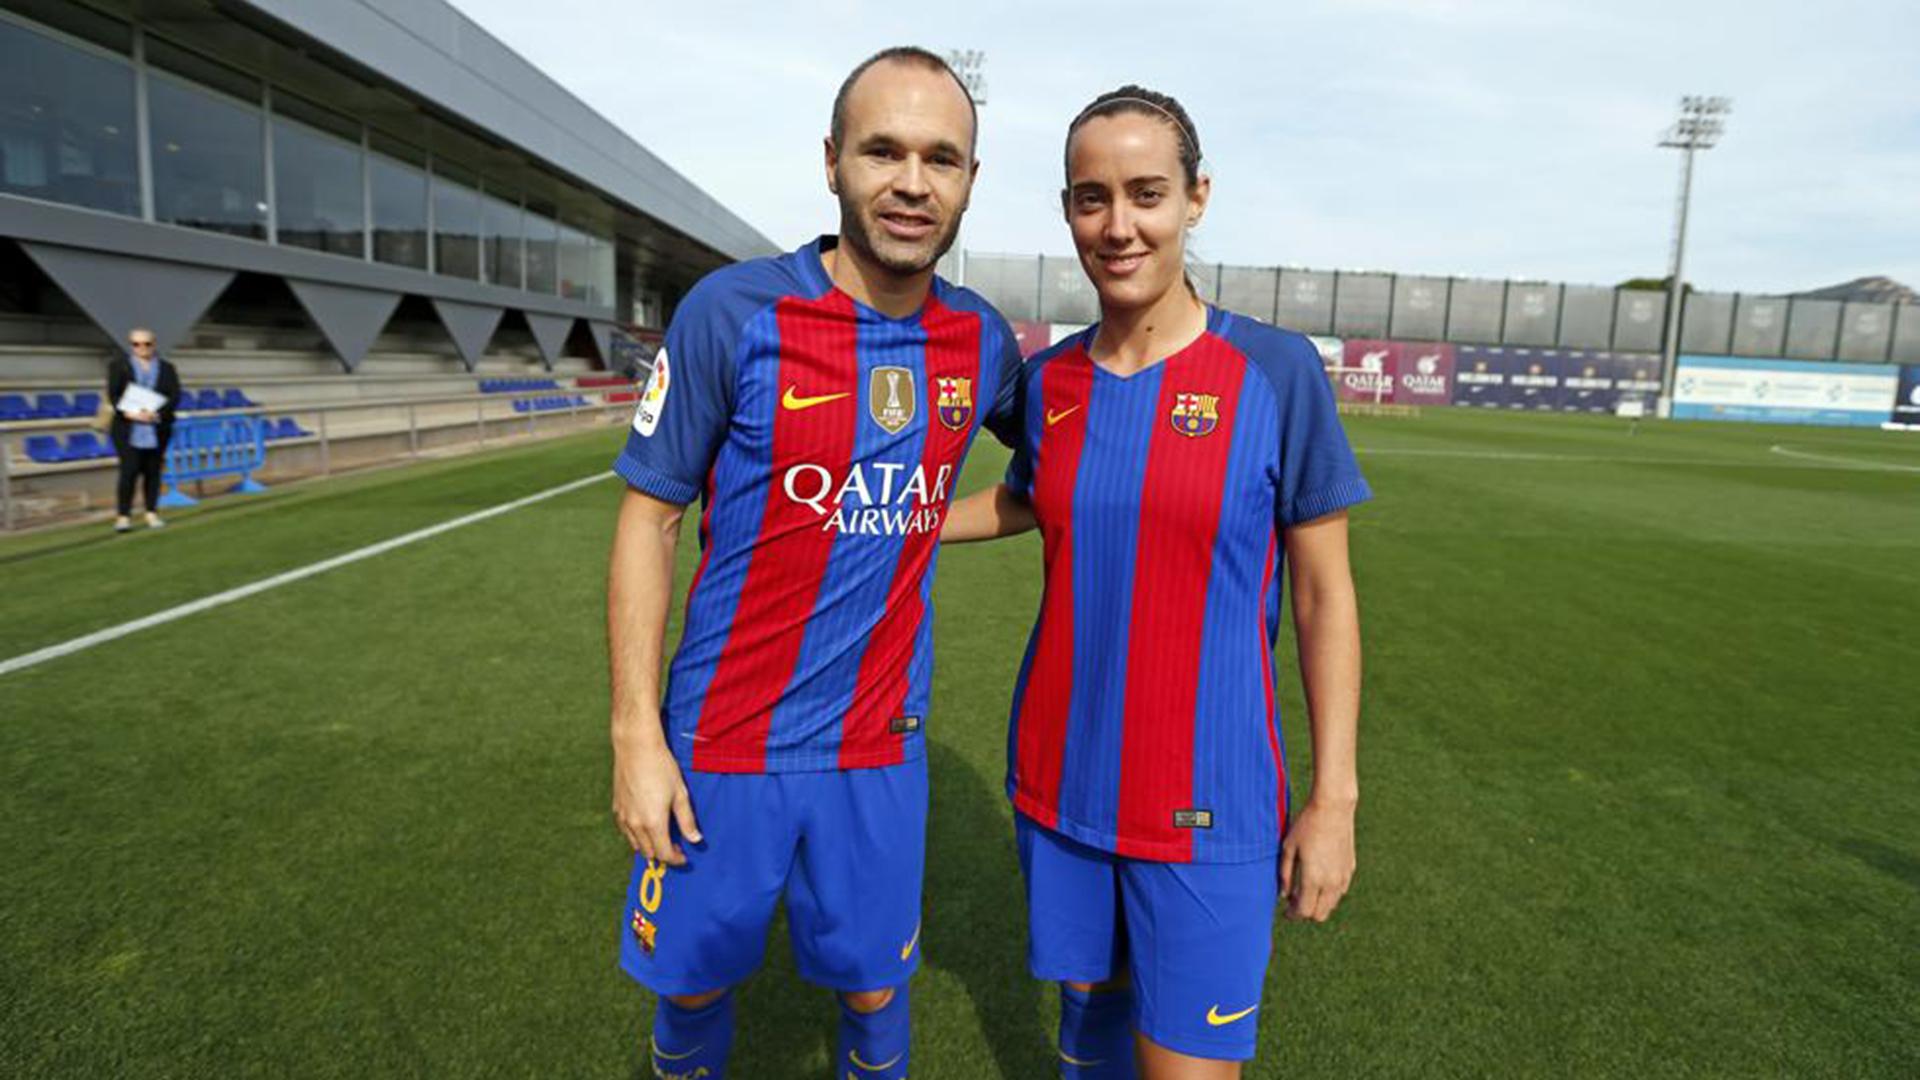 Futbol sin géneros, propone la Liga Española